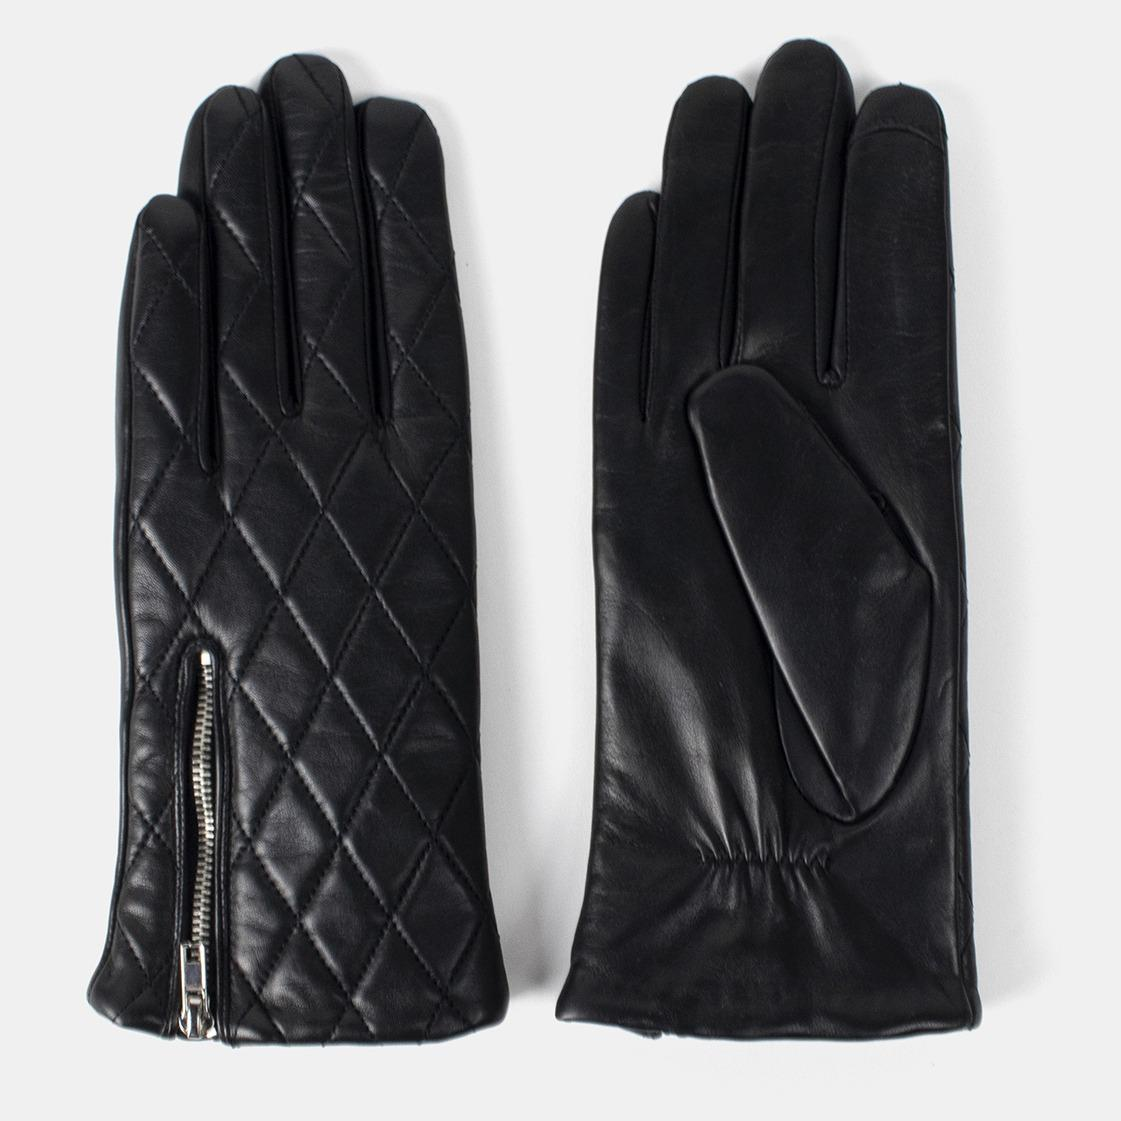 KÄSINEET Anur black Re:designed